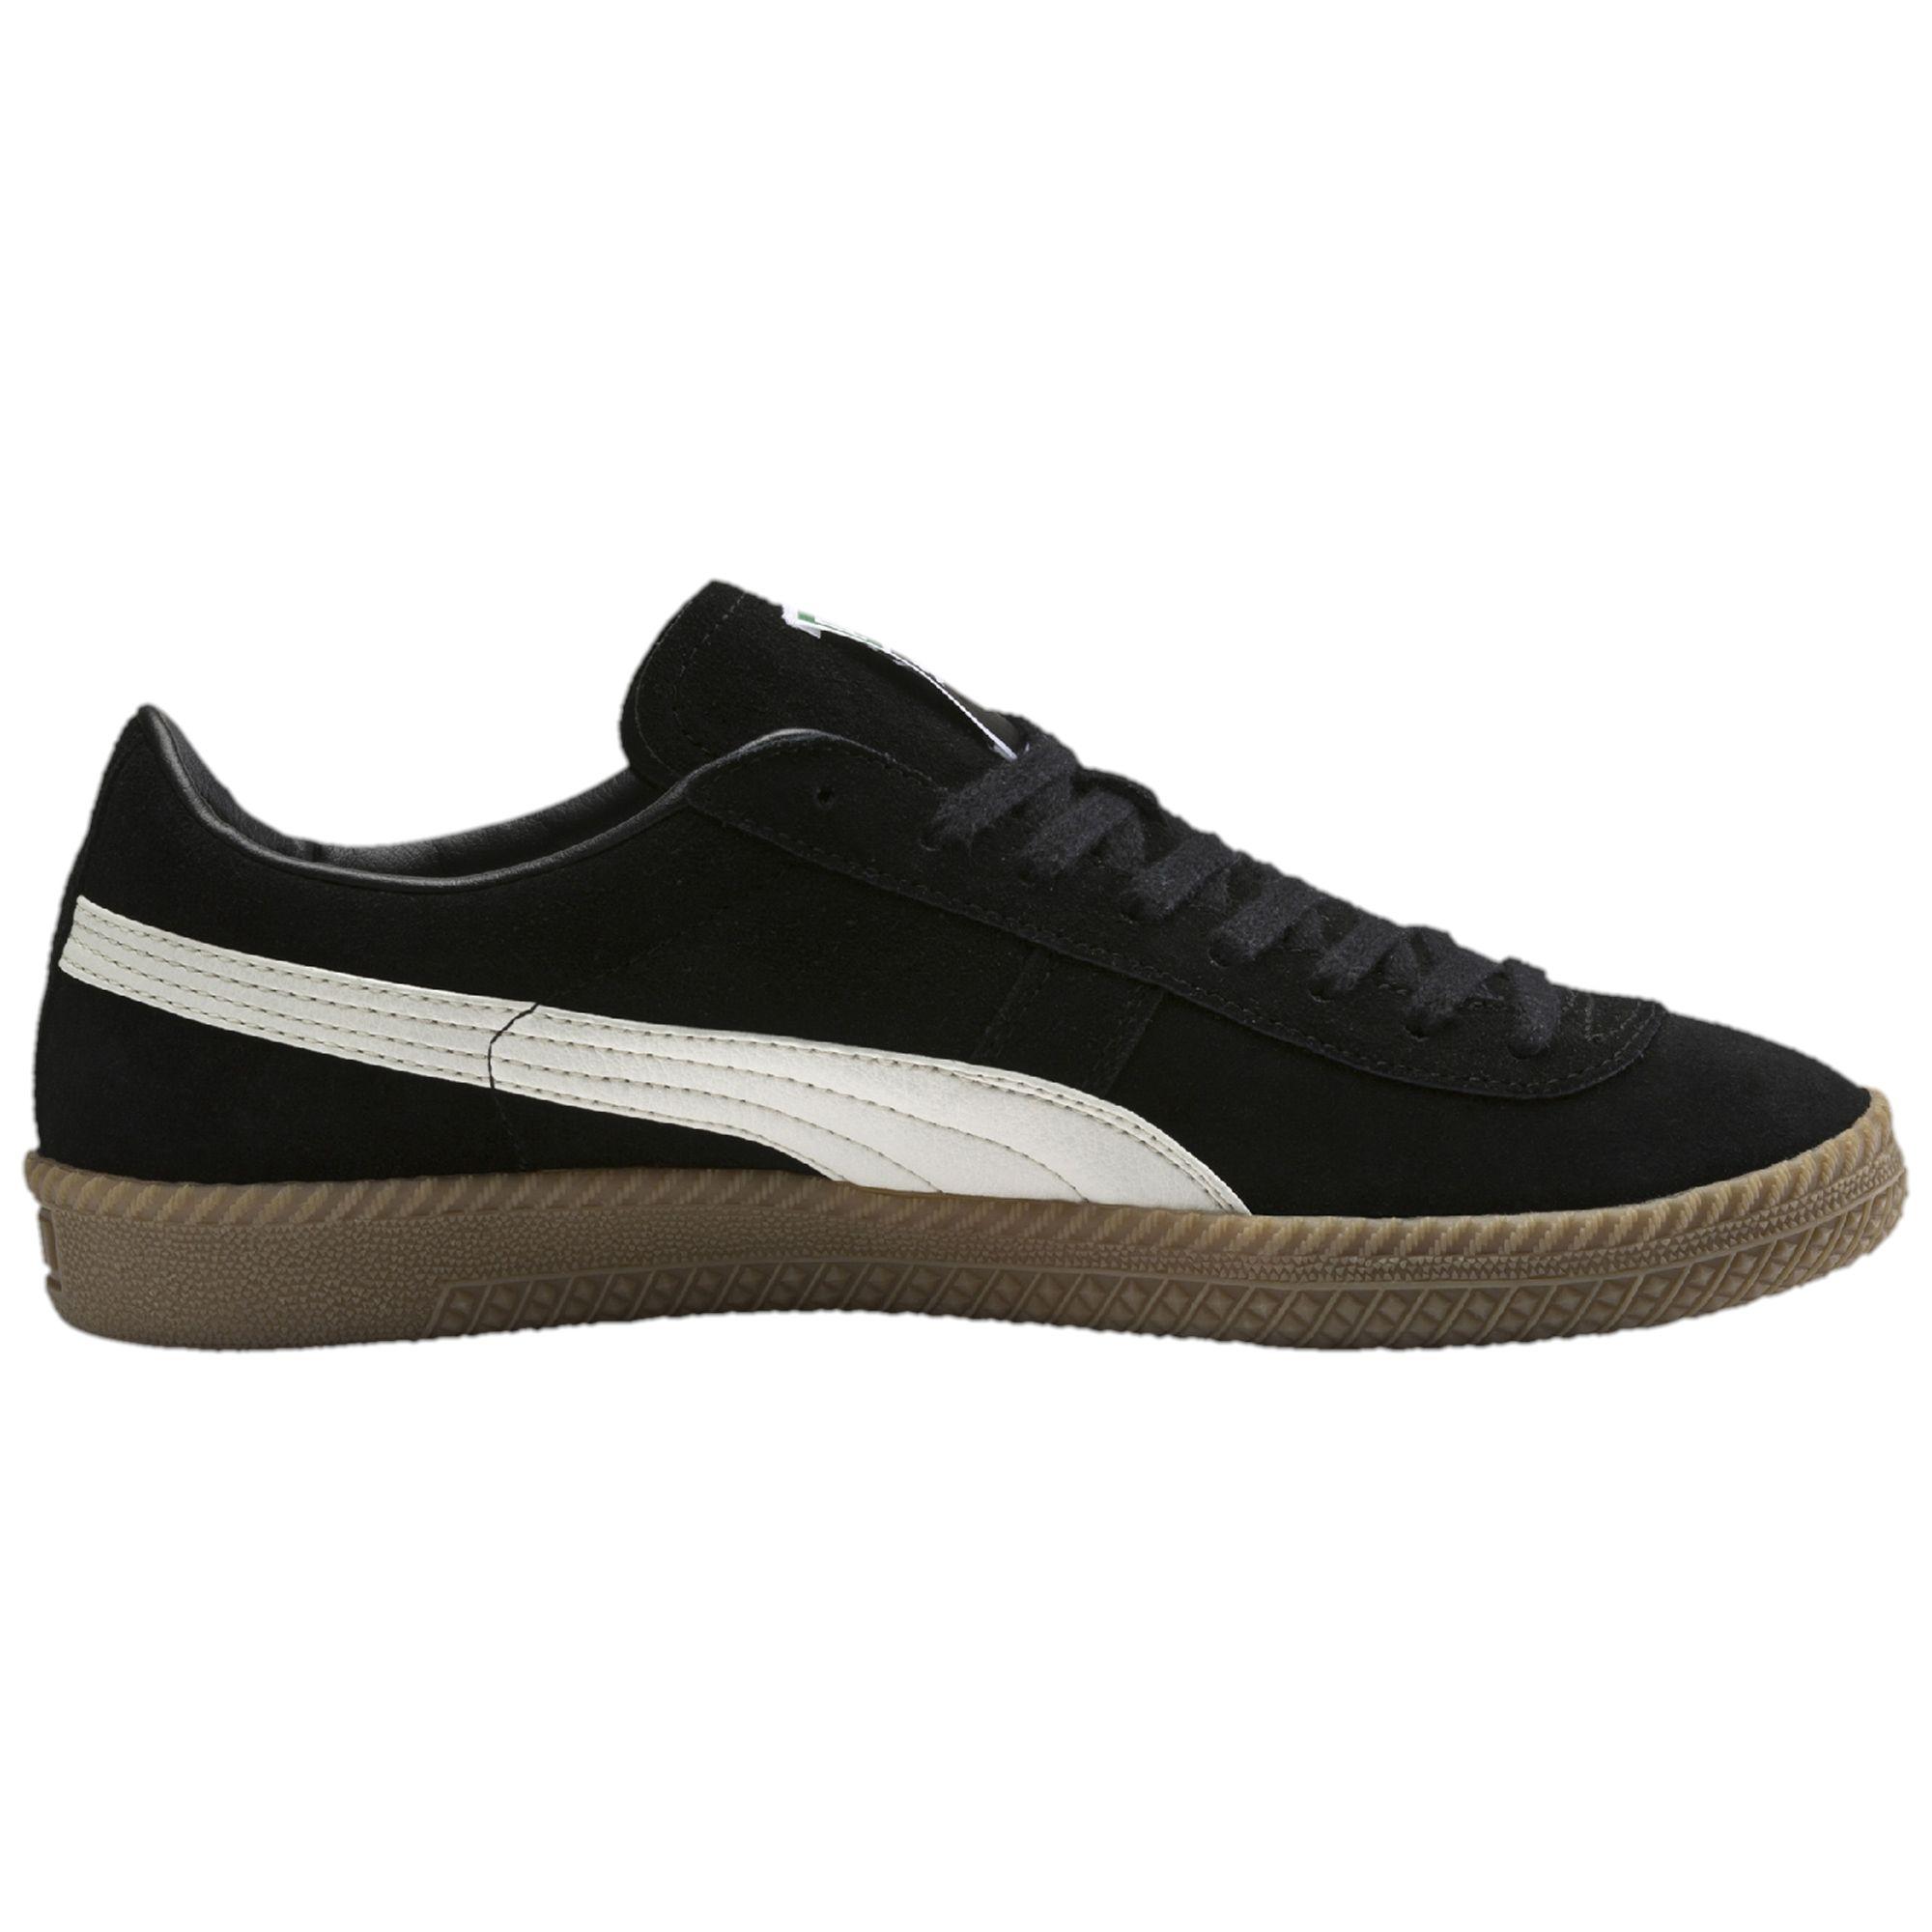 puma puma brasil vintage football sneaker schuhe sneakers. Black Bedroom Furniture Sets. Home Design Ideas